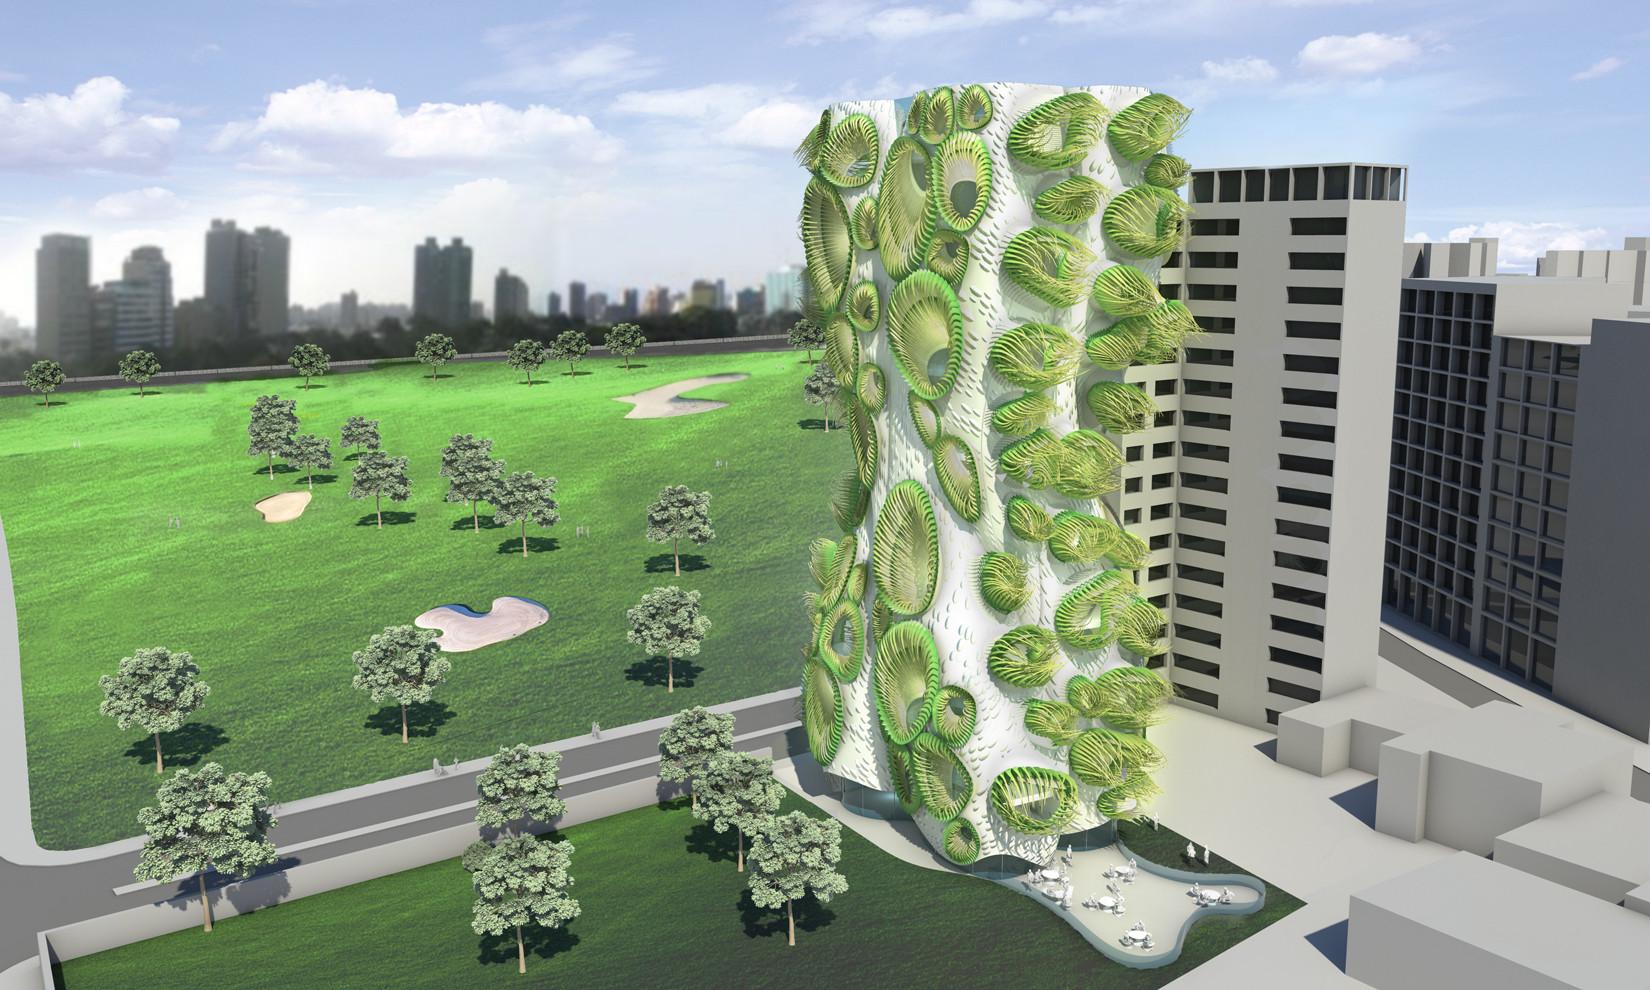 B+U's Housing Tower Rethinks Window DNA